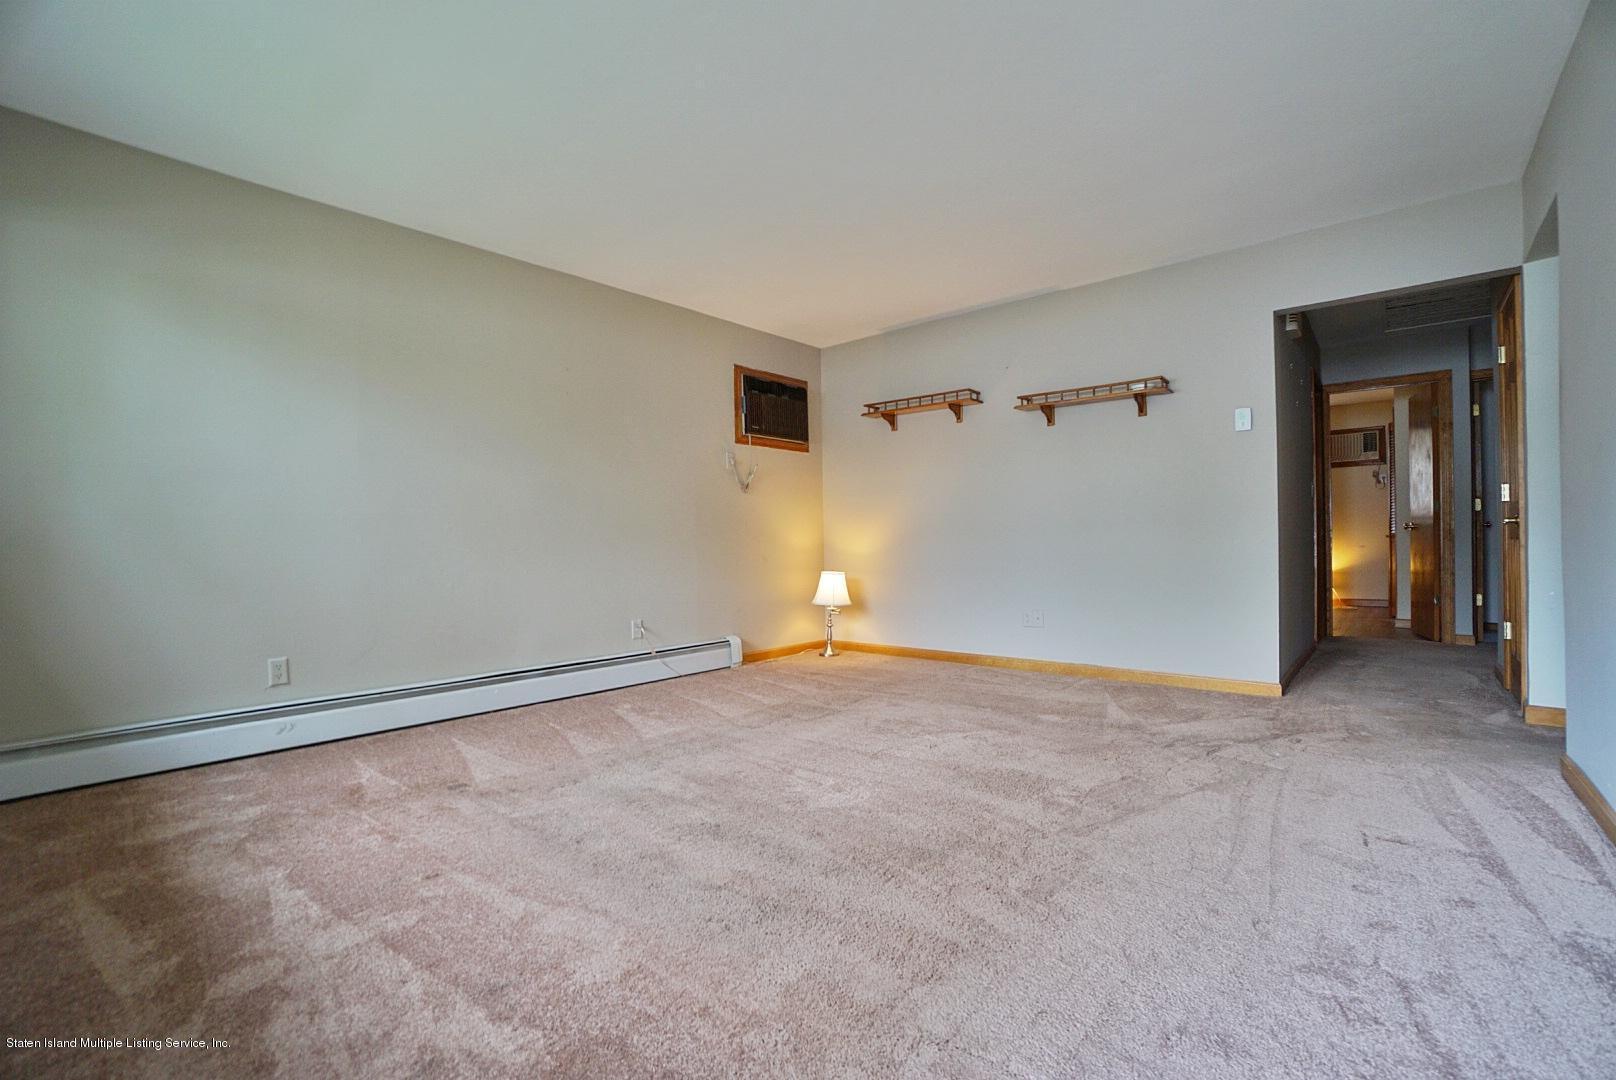 Single Family - Detached 55 Lyndale Avenue  Staten Island, NY 10312, MLS-1128769-12